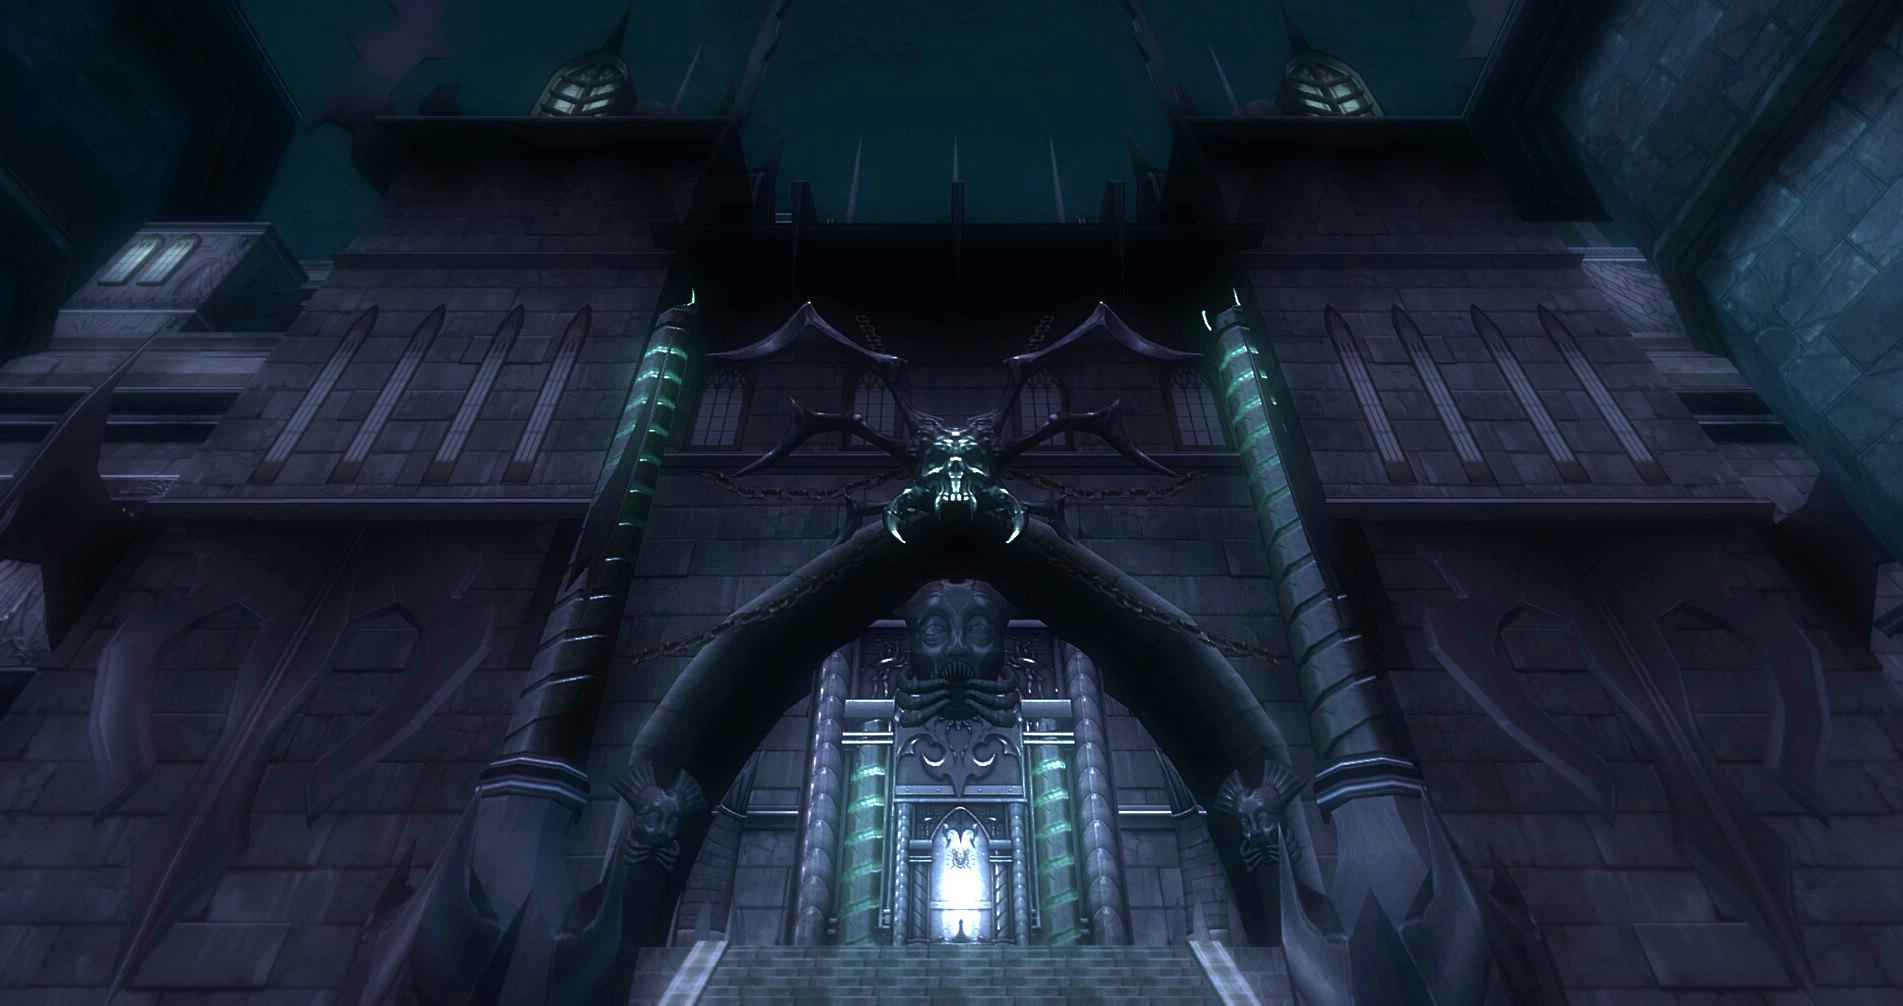 ddmsrealm-ddo-sschindylyrn-portal-opens